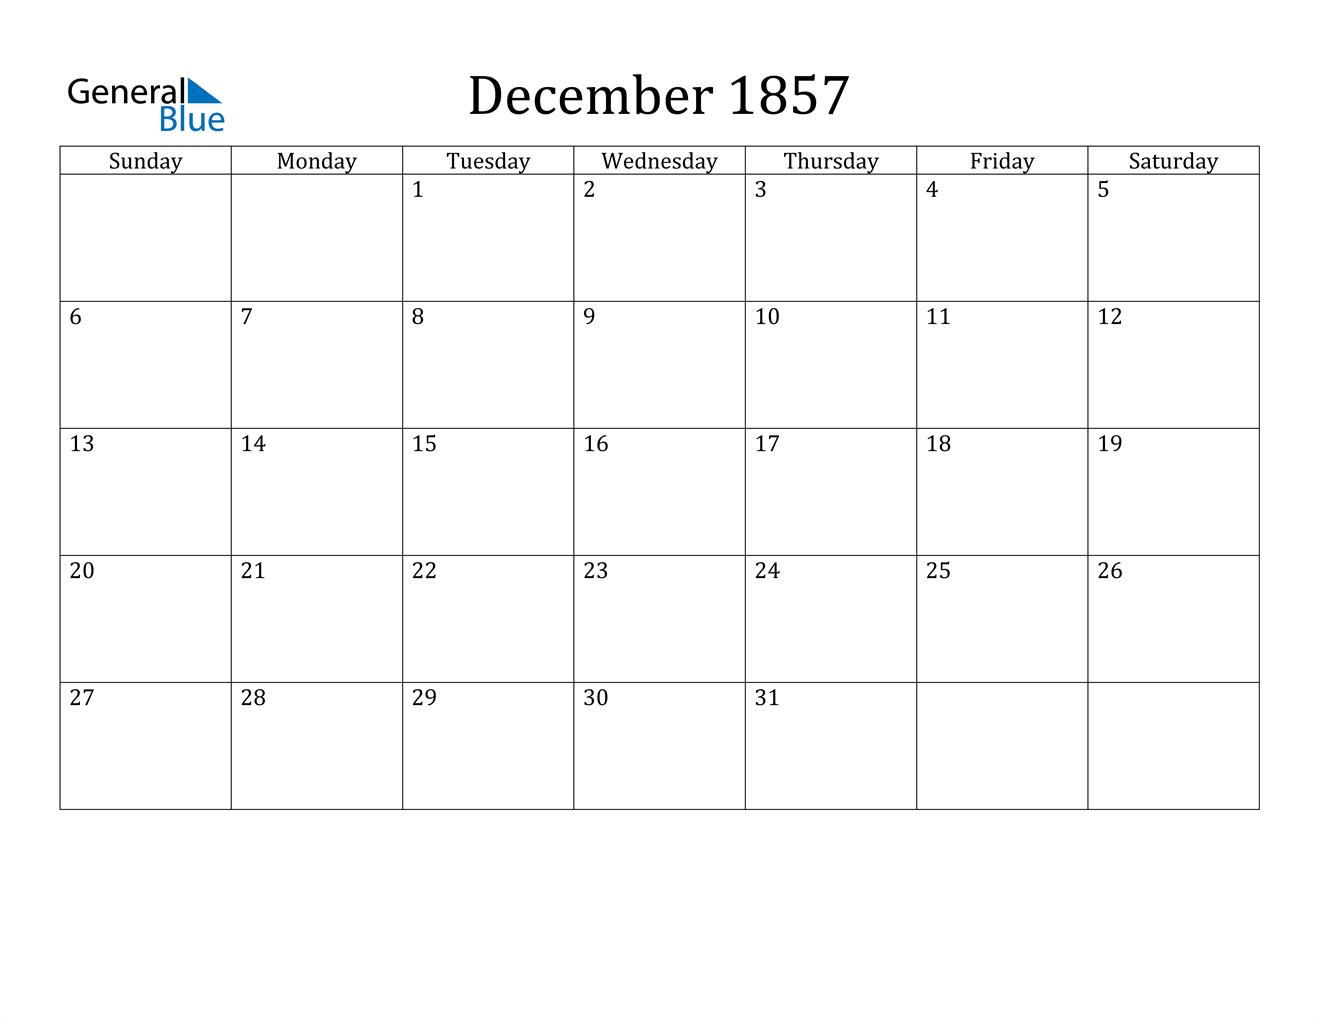 Image of December 1857 Calendar